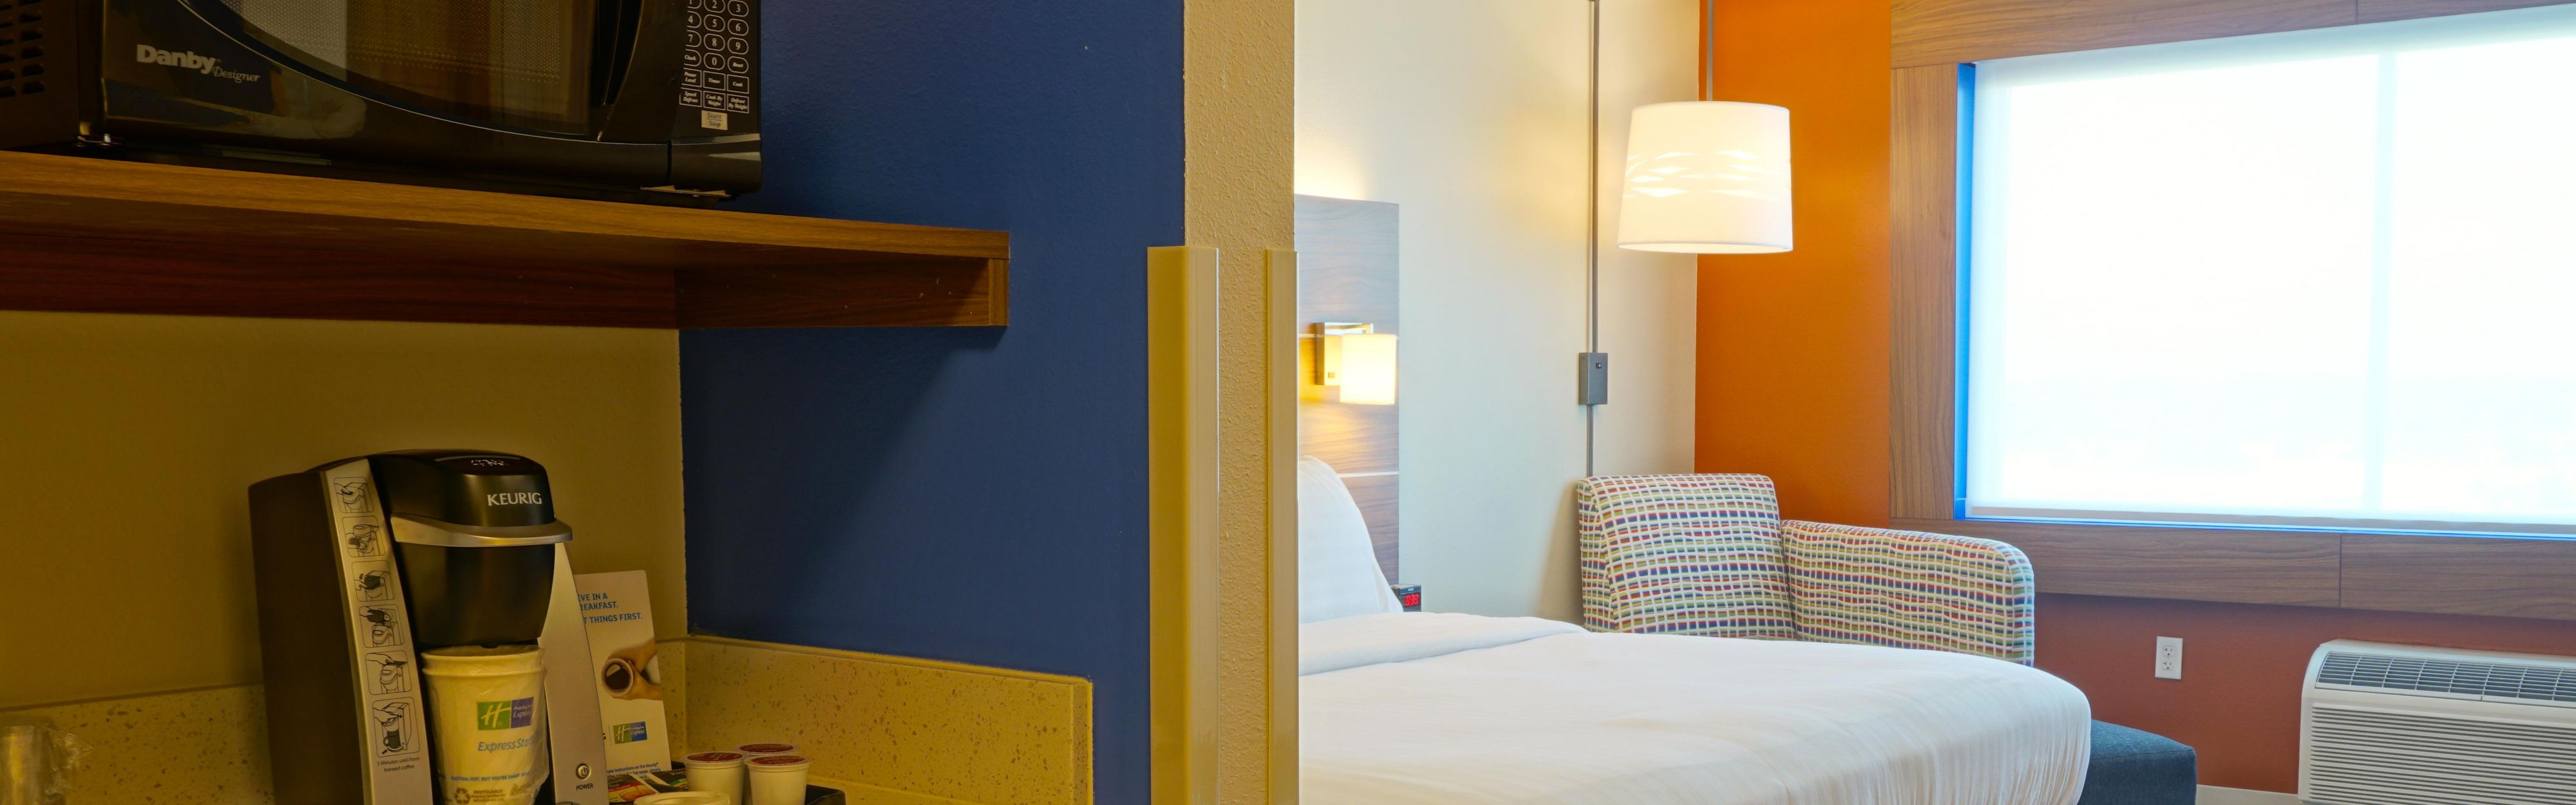 Holiday Inn Express & Suites Omaha - Millard Area image 1